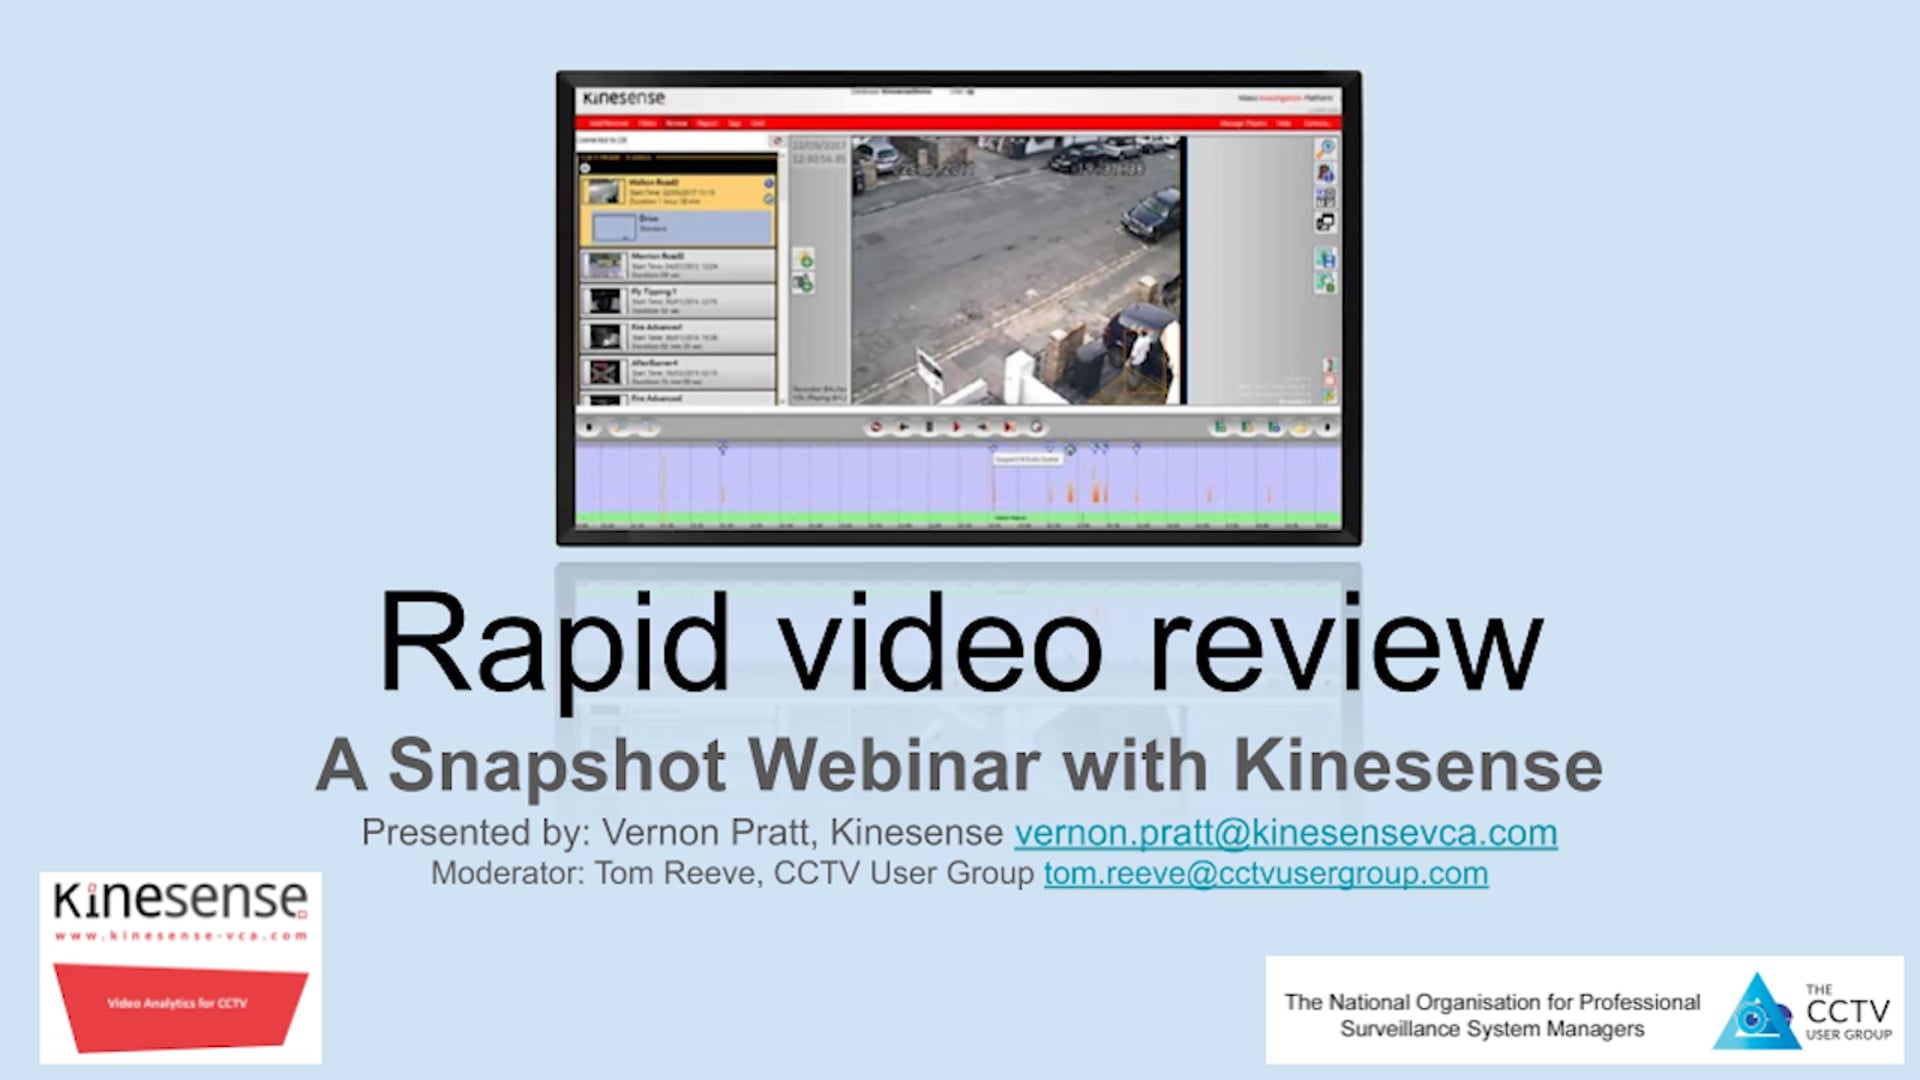 02 Snapshot Webinar with Kinesense - 10 Dec 2020